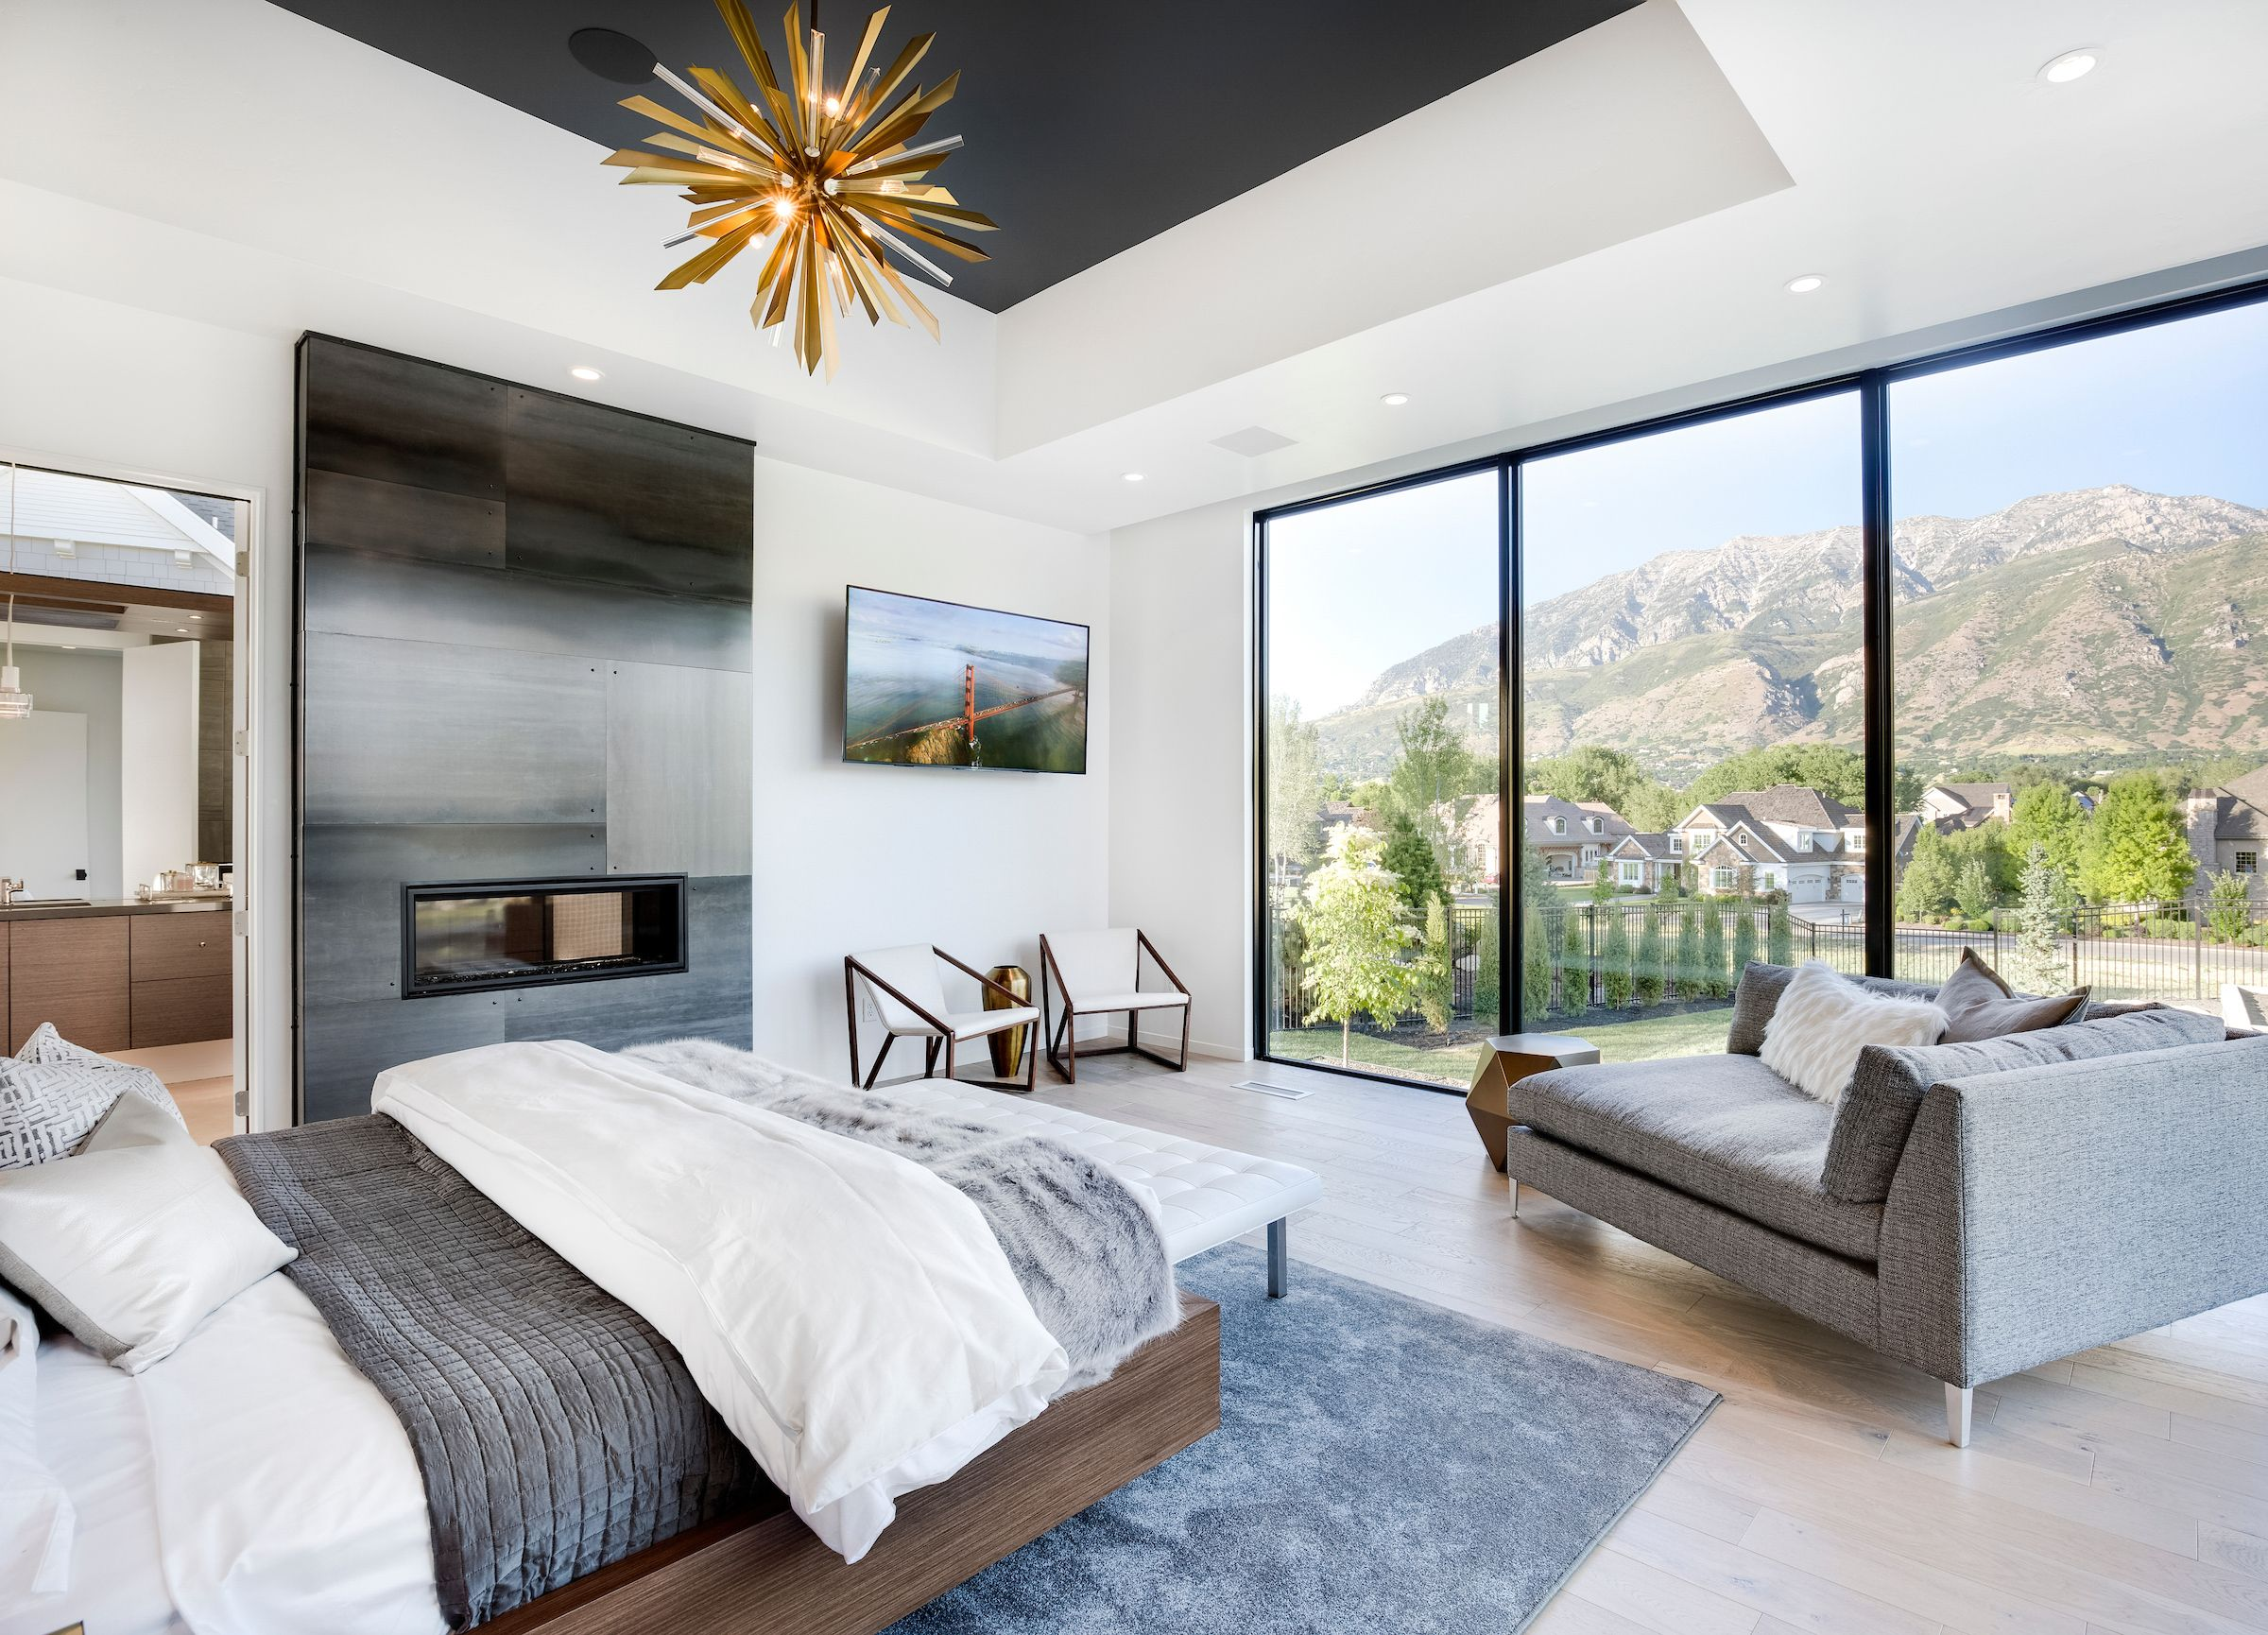 Best Modern Master Bedroom The Room Has Floor To Ceiling 400 x 300